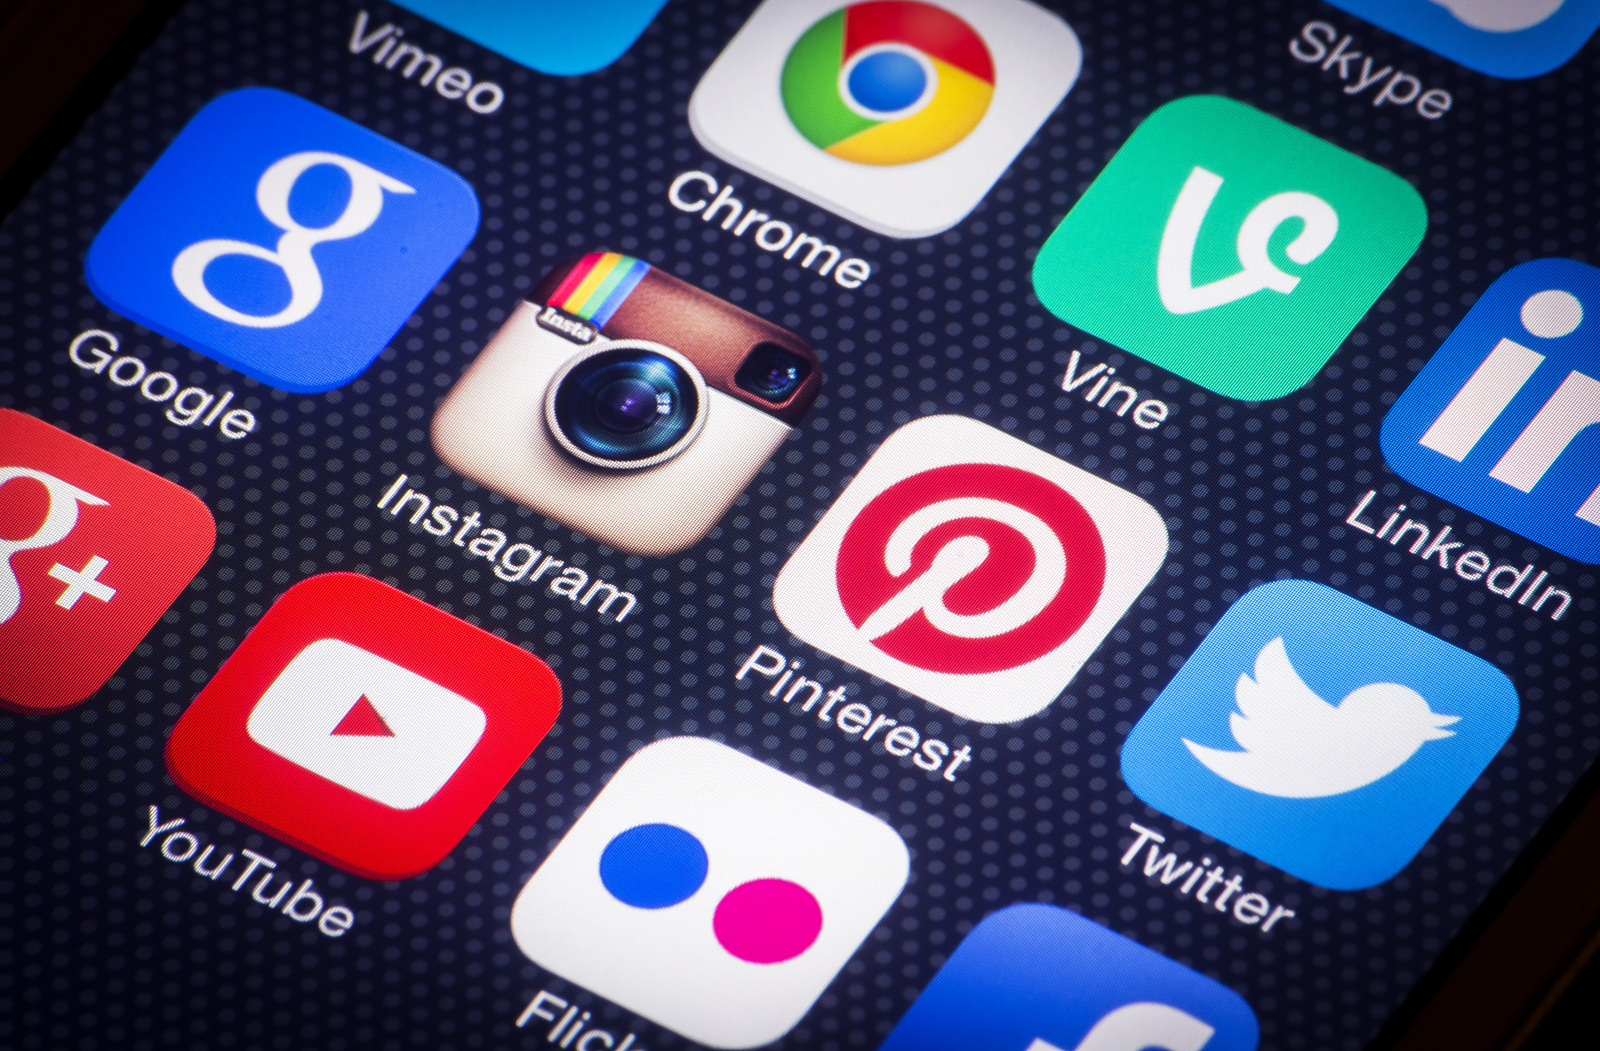 social media icons van showlight